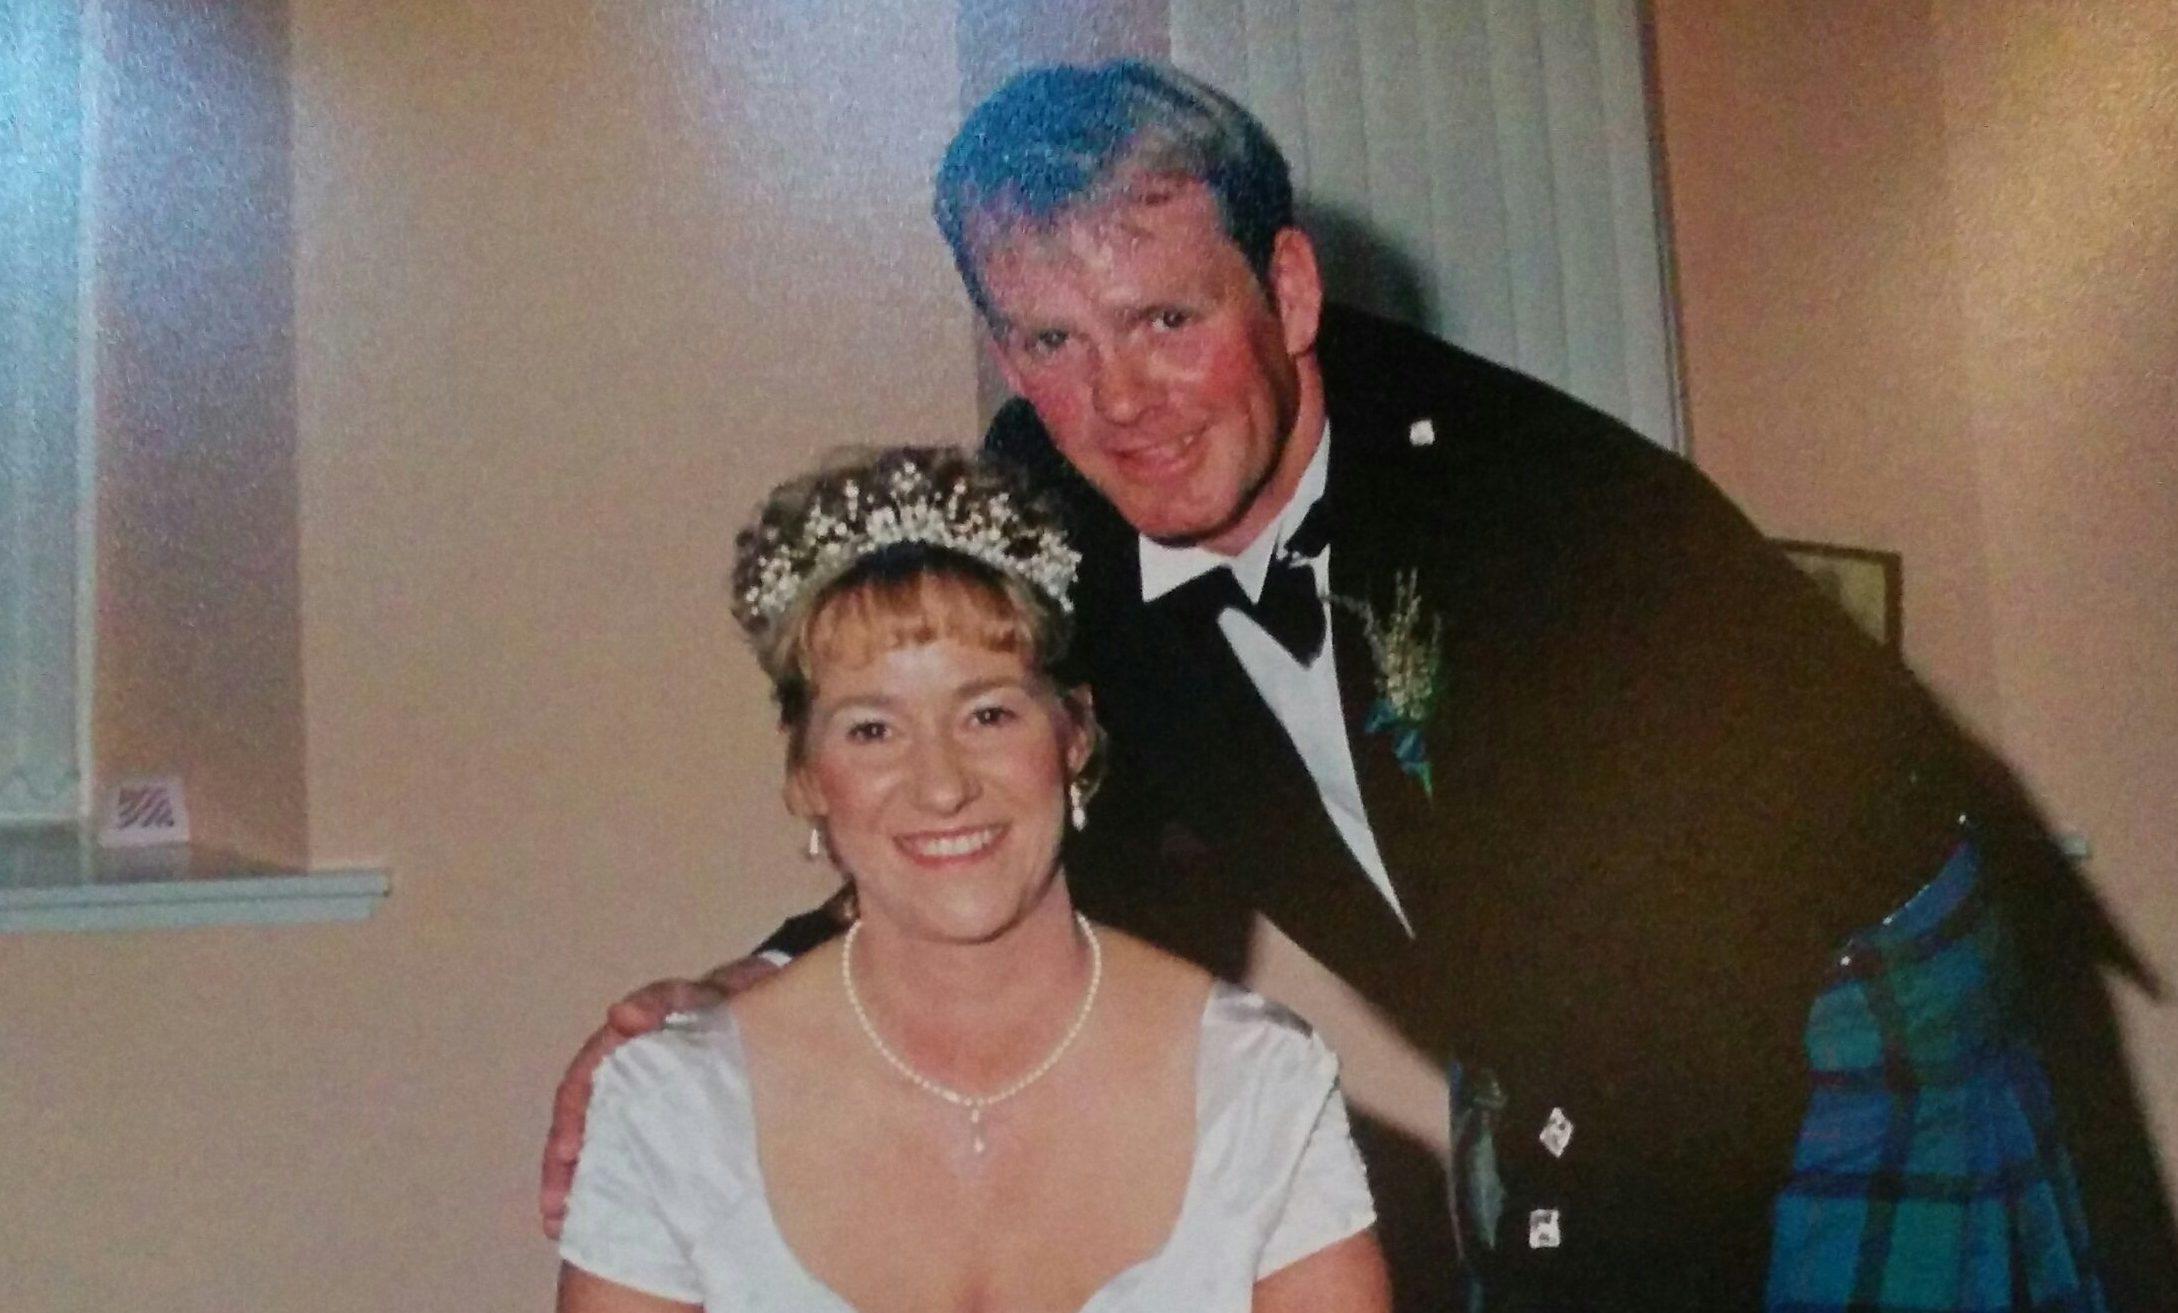 Ian and Lorna on their wedding day.